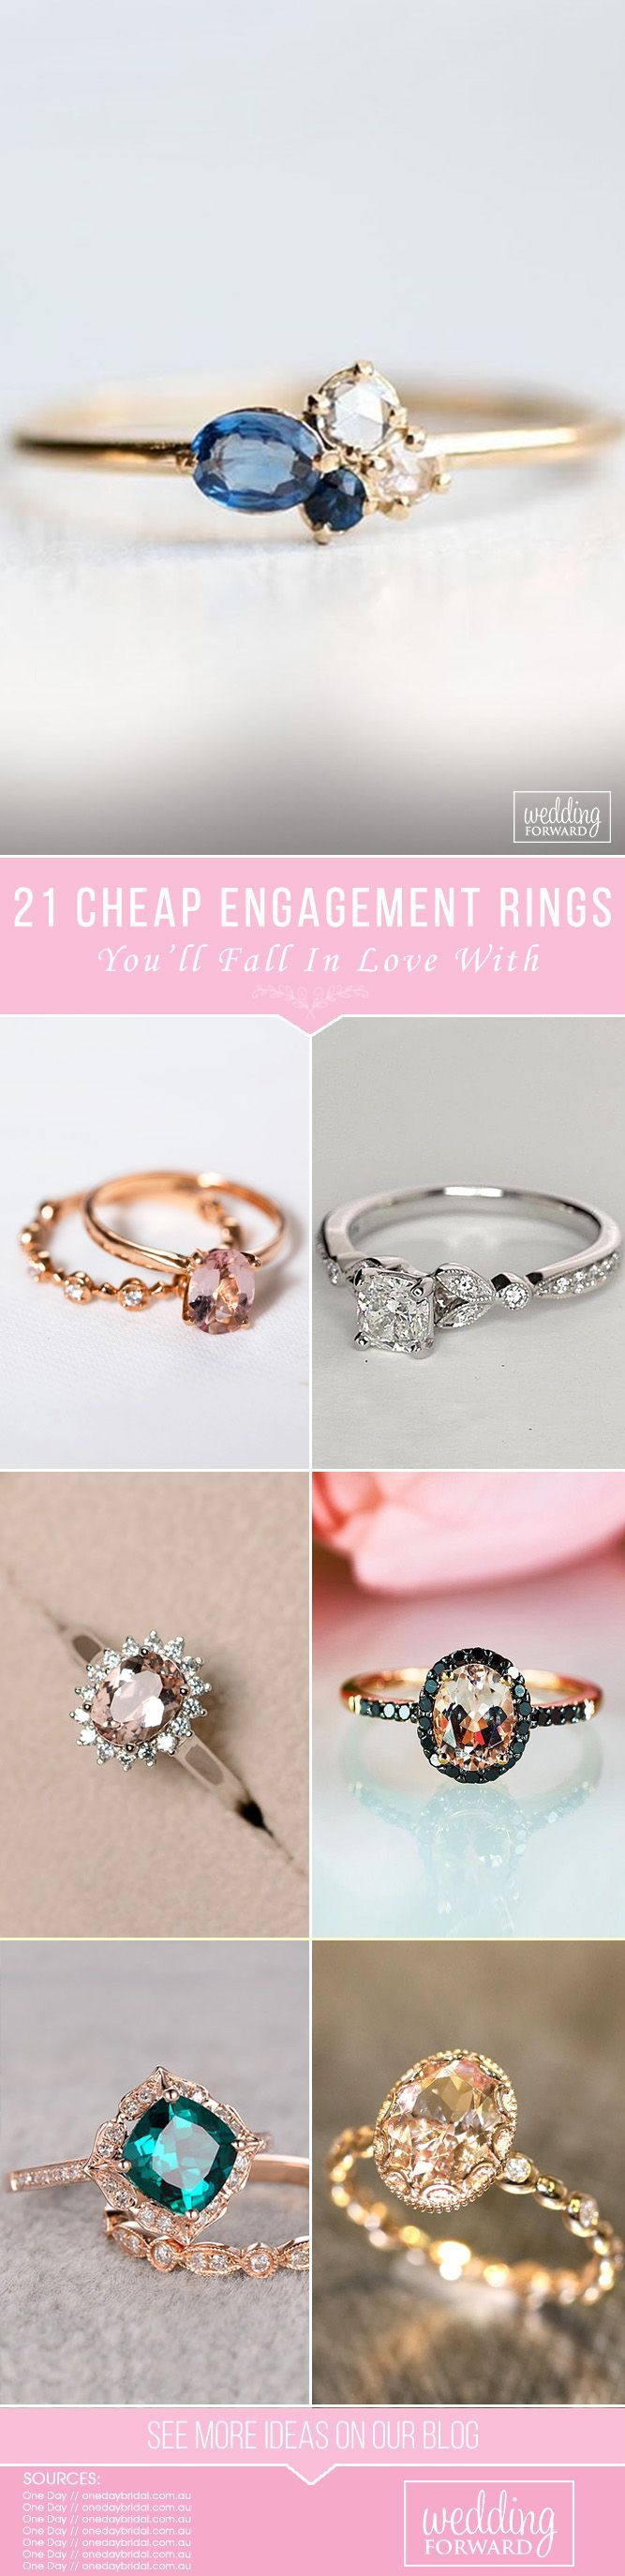 Best 25 Bud friendly engagement rings ideas on Pinterest